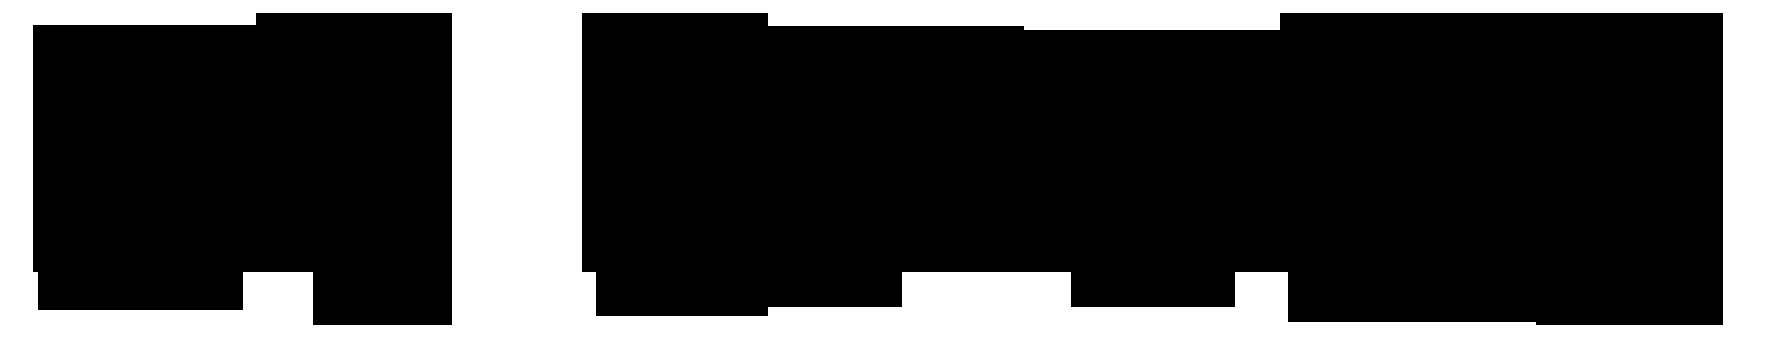 logo_zwart_despinse.png